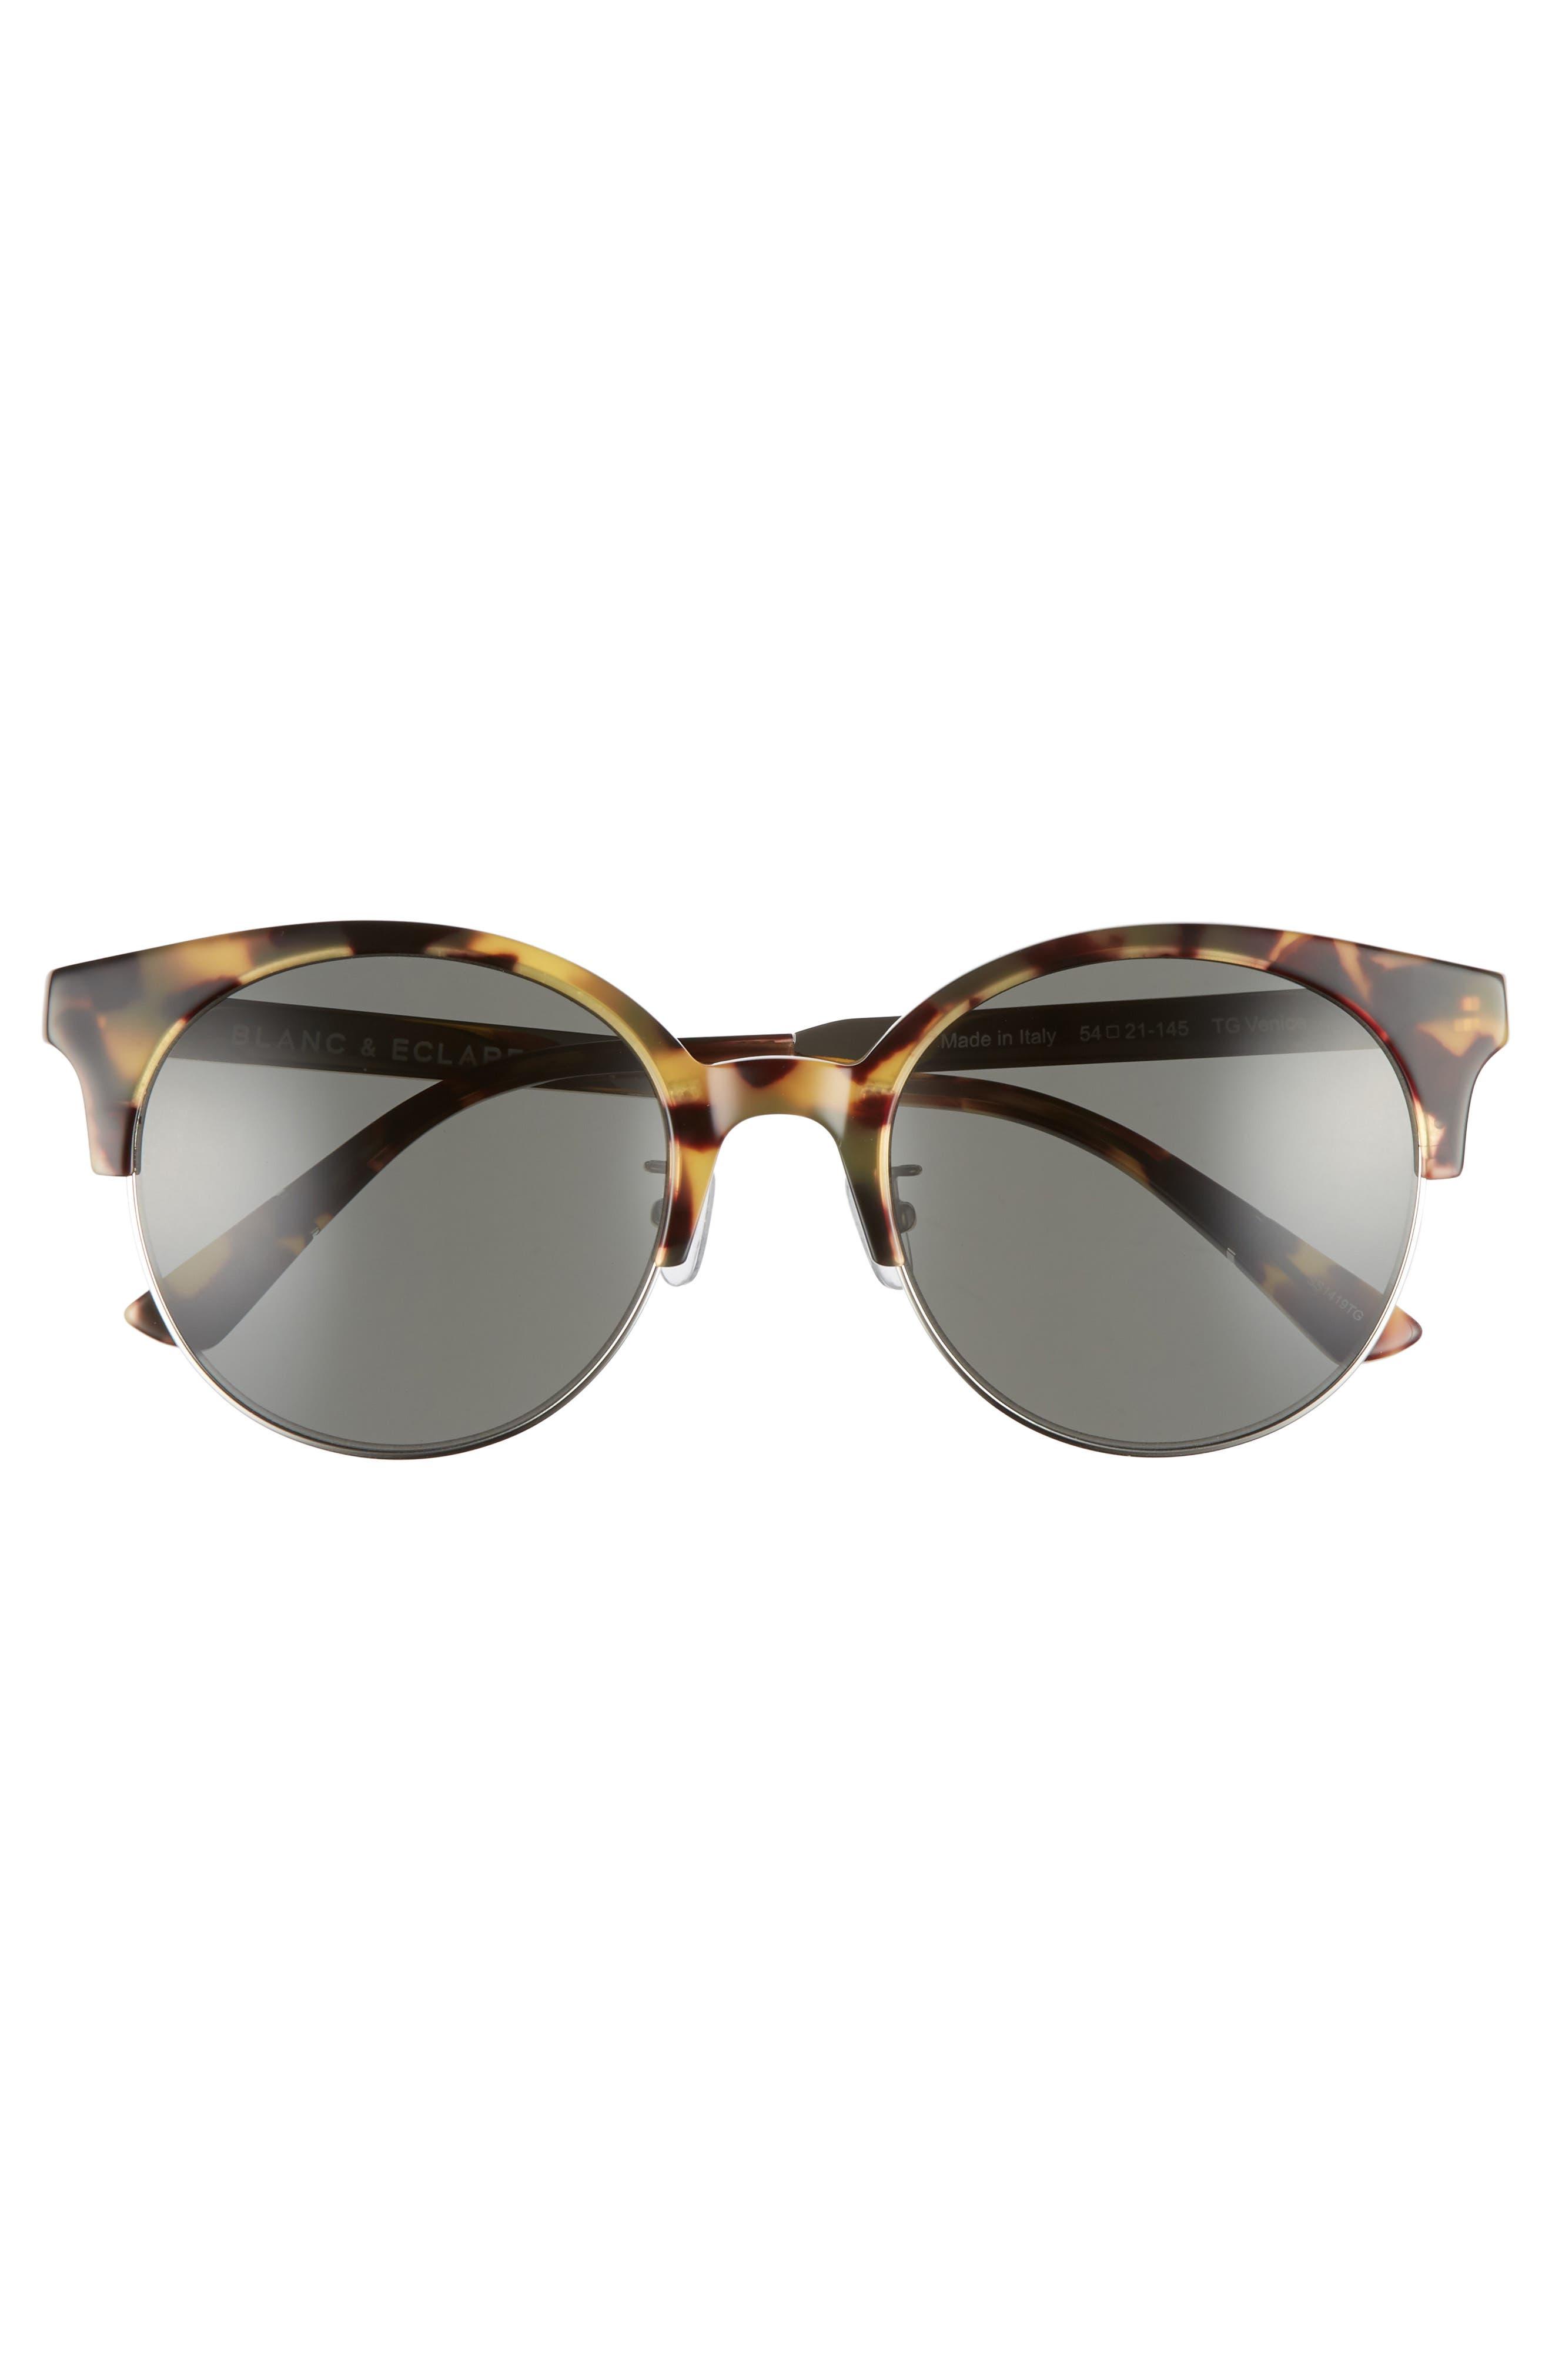 BLANC & ECLARE Venice Round Sunglasses,                             Alternate thumbnail 3, color,                             Tortoise/ Grey